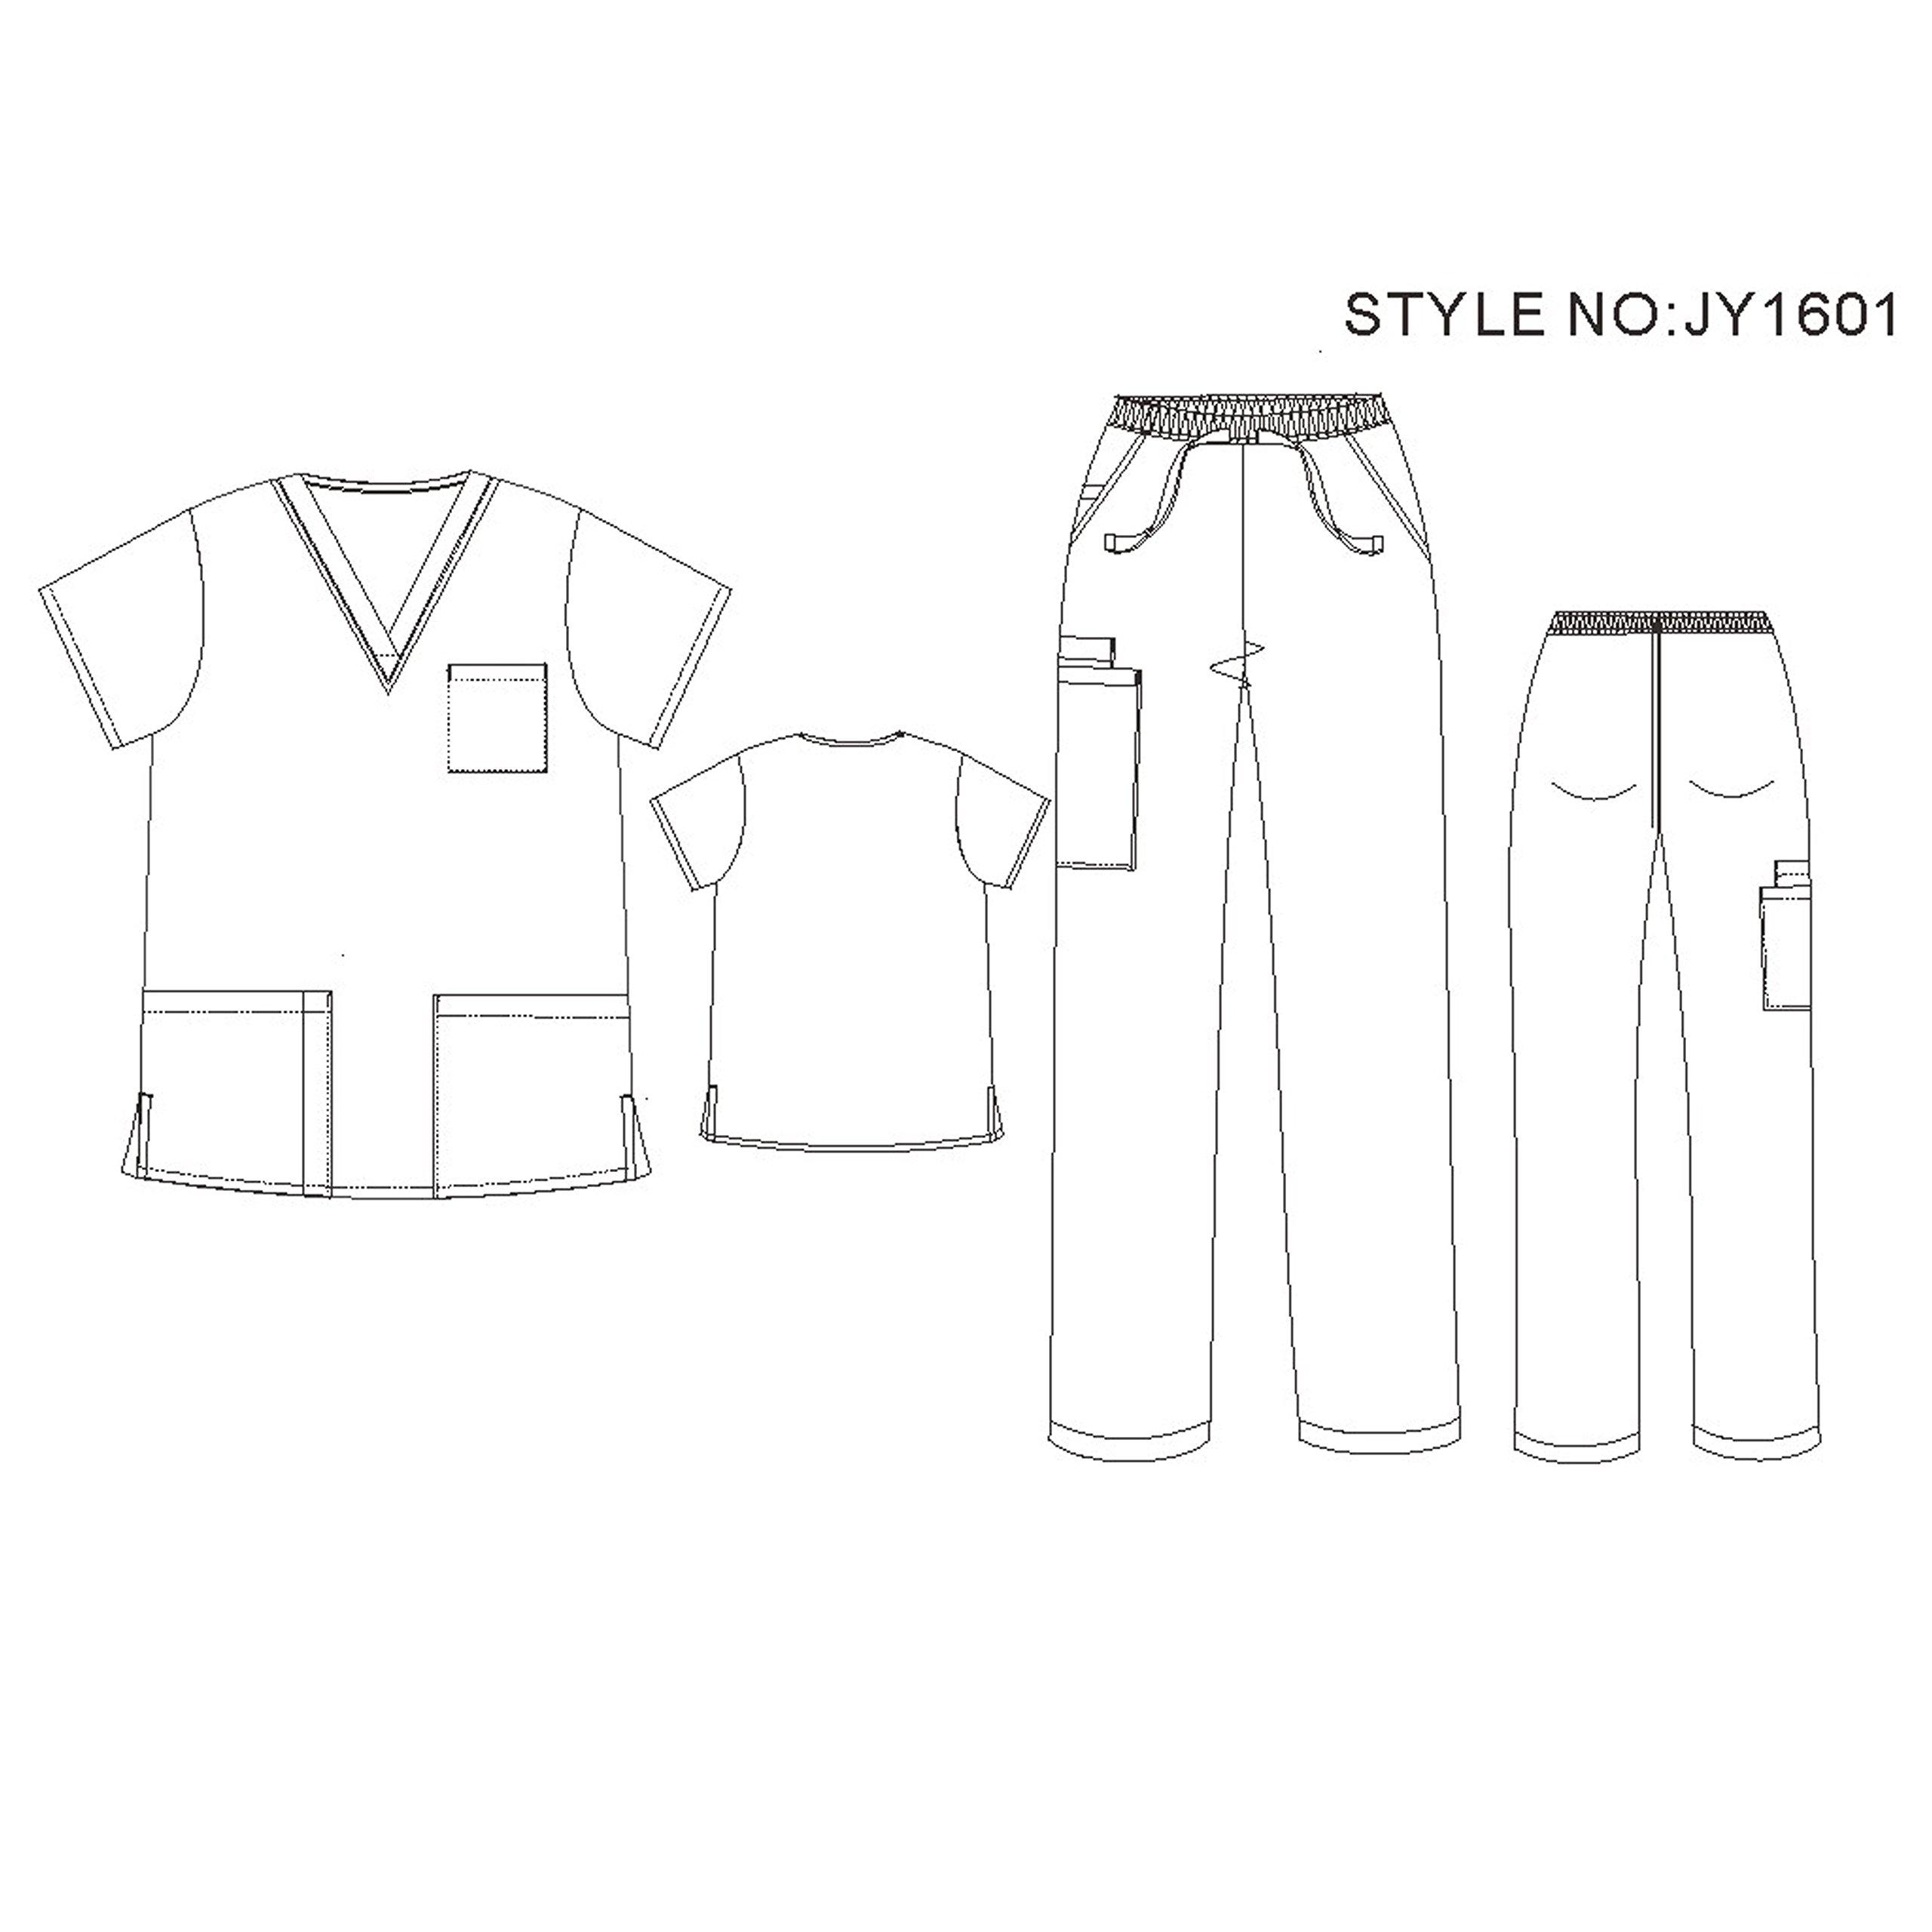 Unisex V Neck Scrubs Set Medical Uniform - Women and Man Nursing Scrubs Set Top and Pants Workwear JY1601 (CeilBlue, XL)